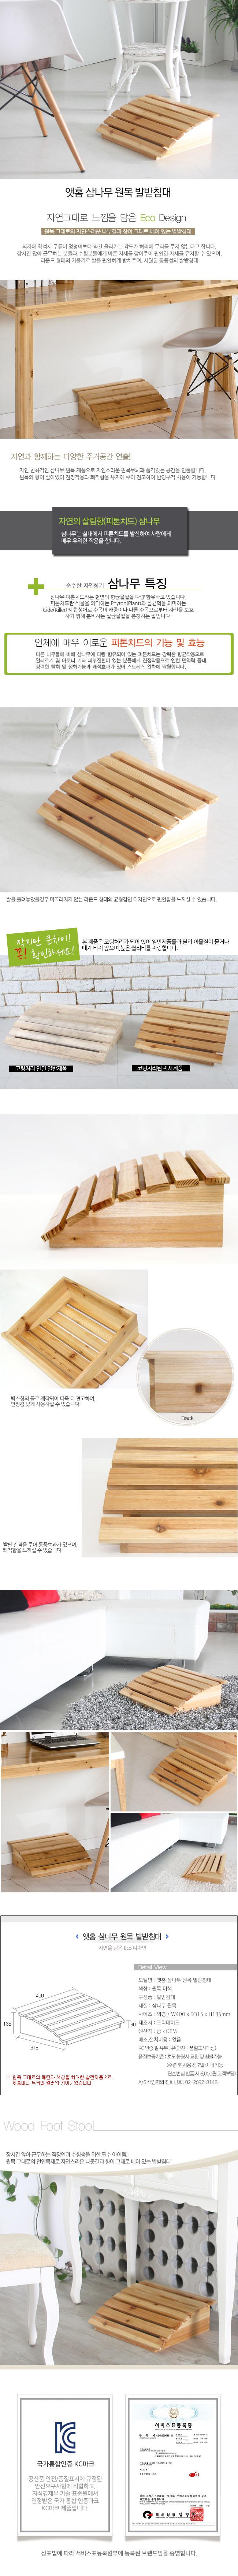 athome_wood_footrest_info_112045.jpg